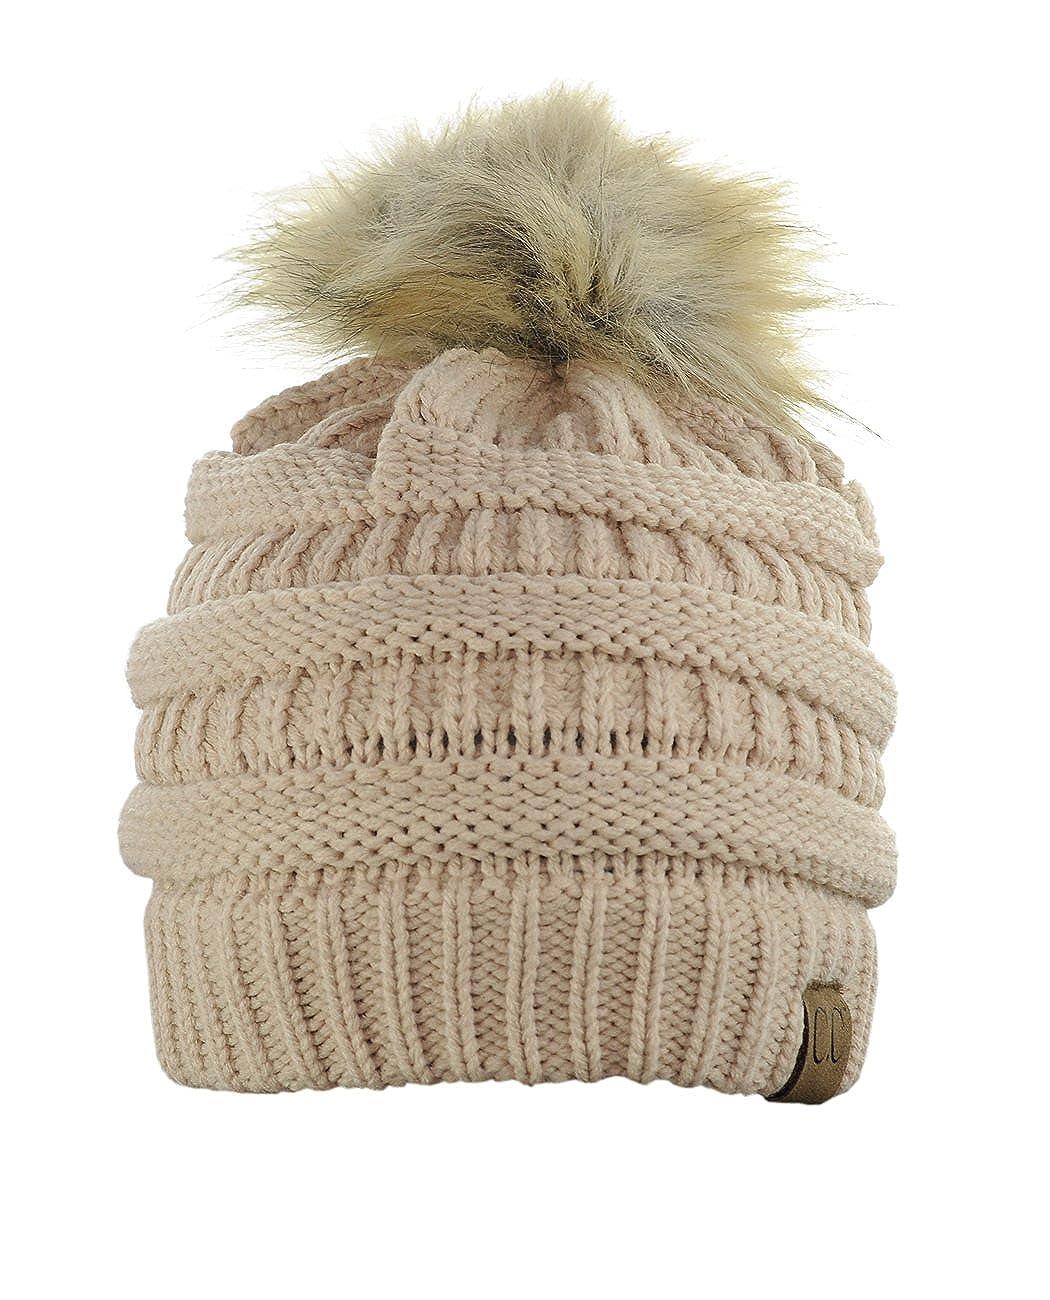 NYFASHION101 Exclusive Soft Stretch Cable Knit Faux Fur Pom Pom Beanie Hat